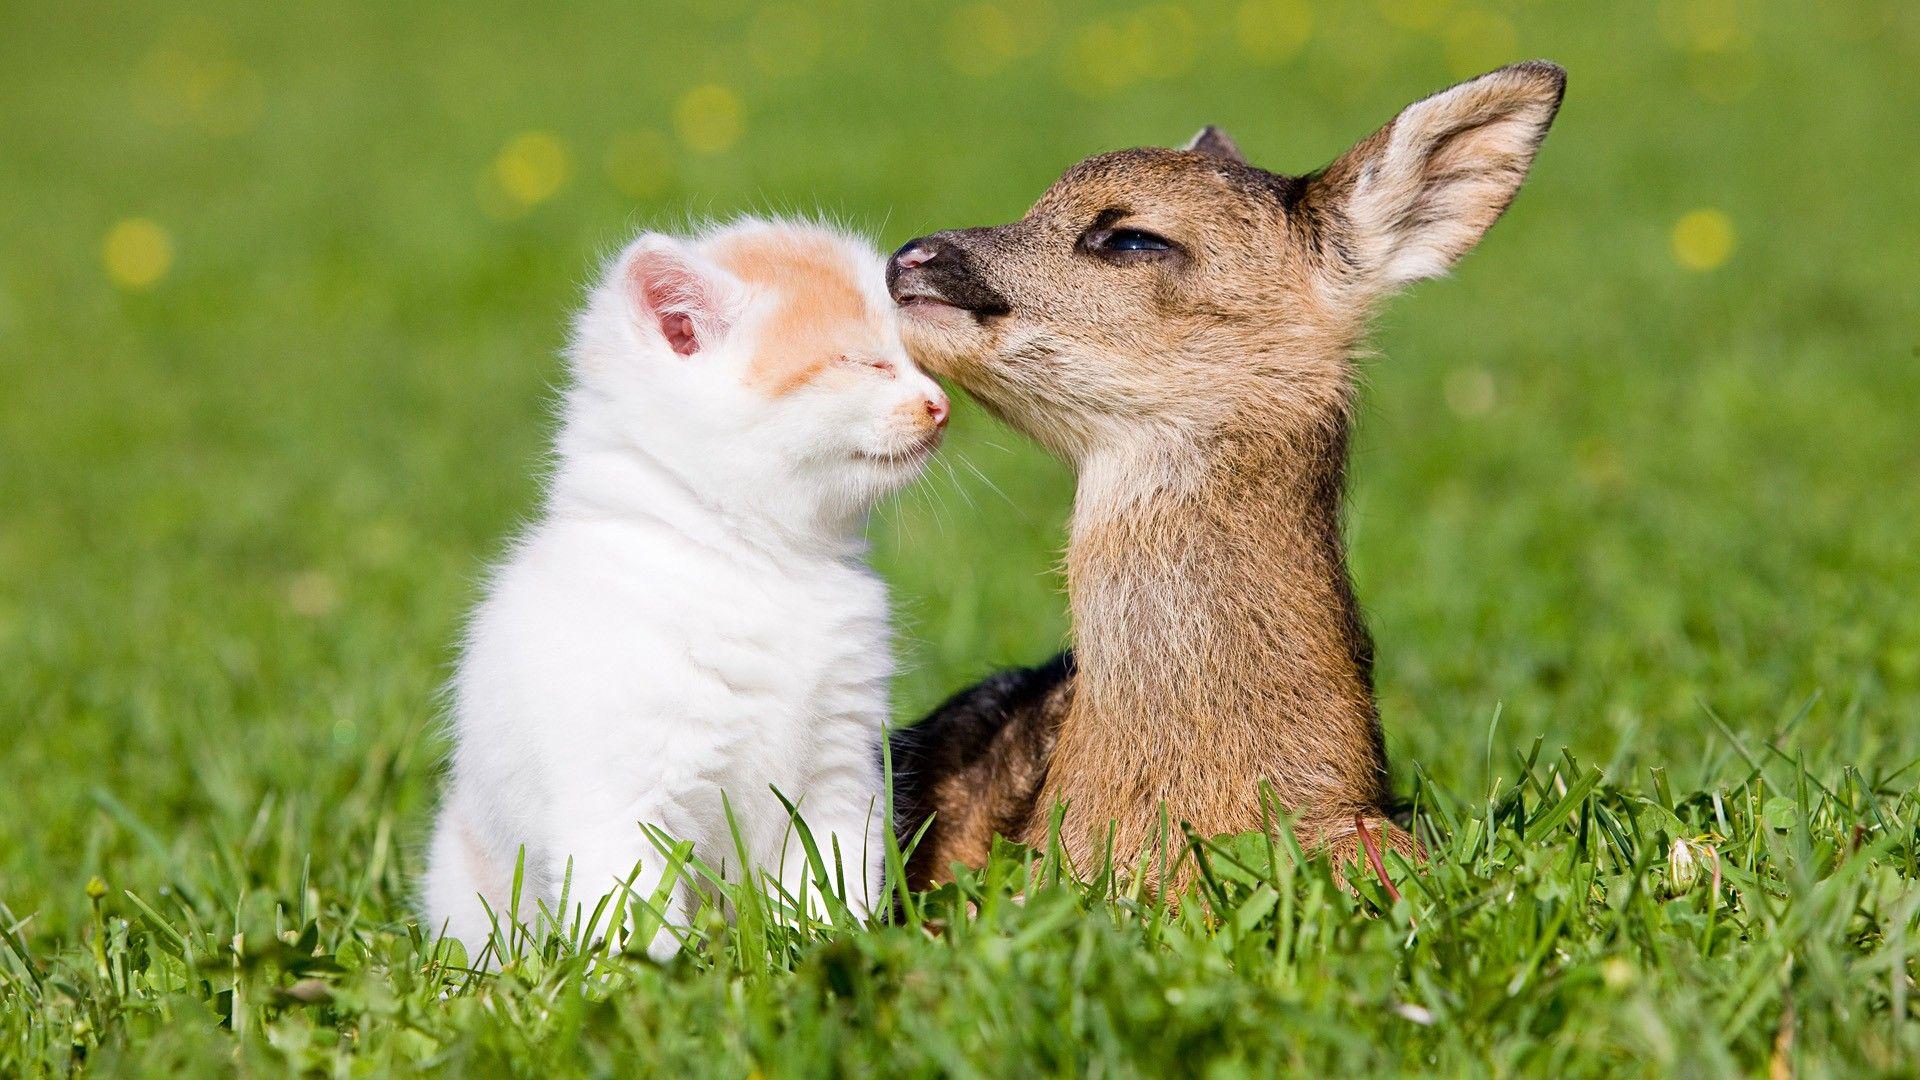 New Friends Kitten And Baby Dear Imgur Animals Friends Animals Friendship Cute Animals